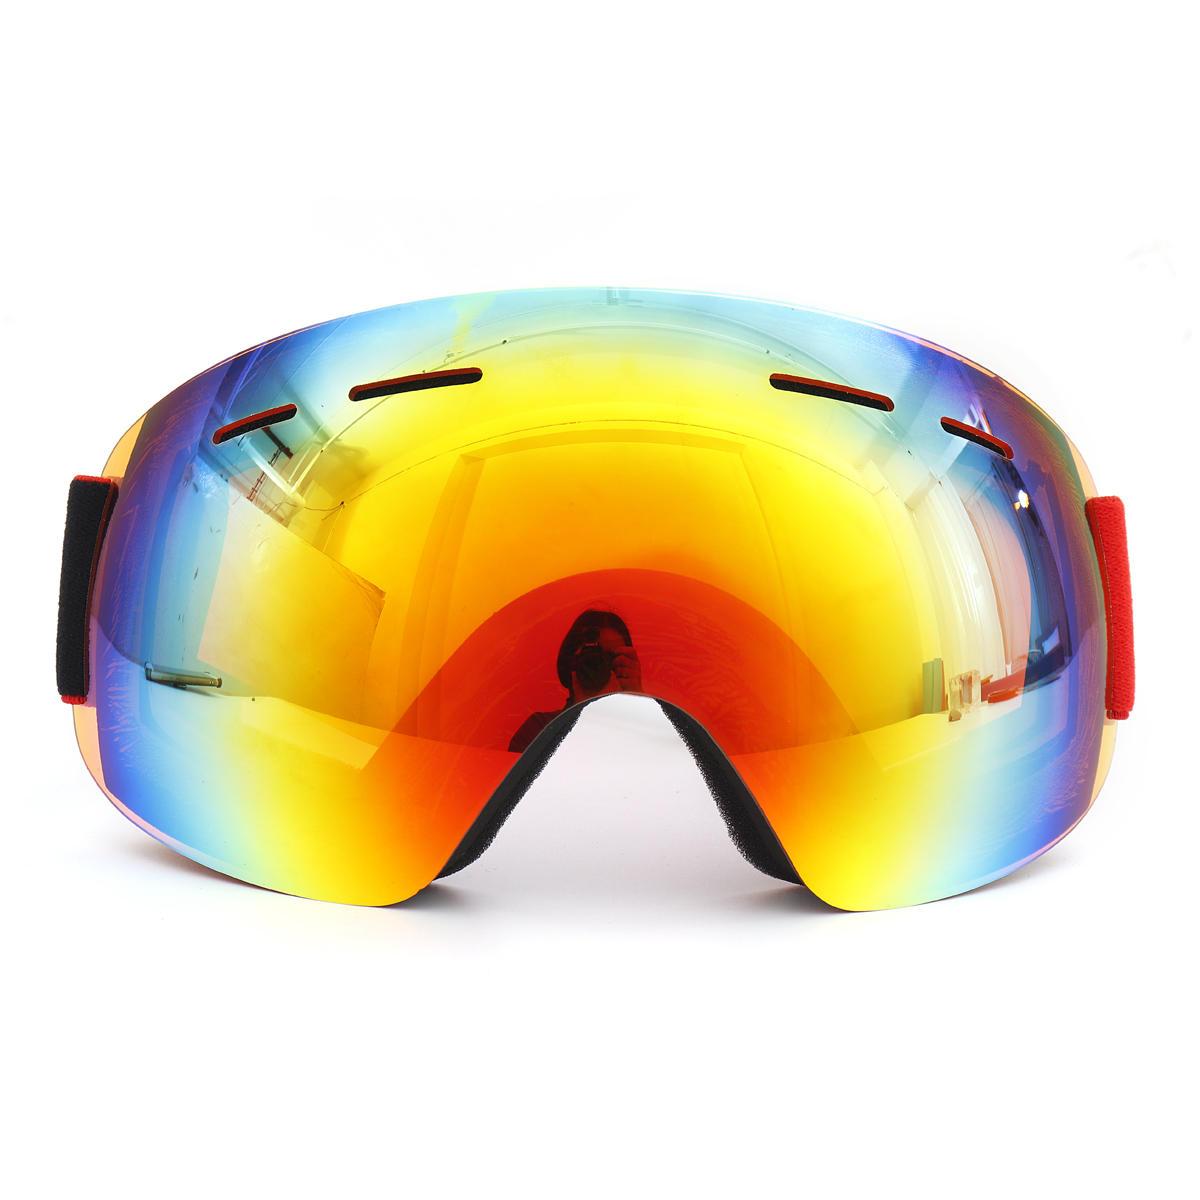 Vintage Motorcycle Goggles Adult Cool Glasses Colorful Lens Eyewear Anti UV Fog